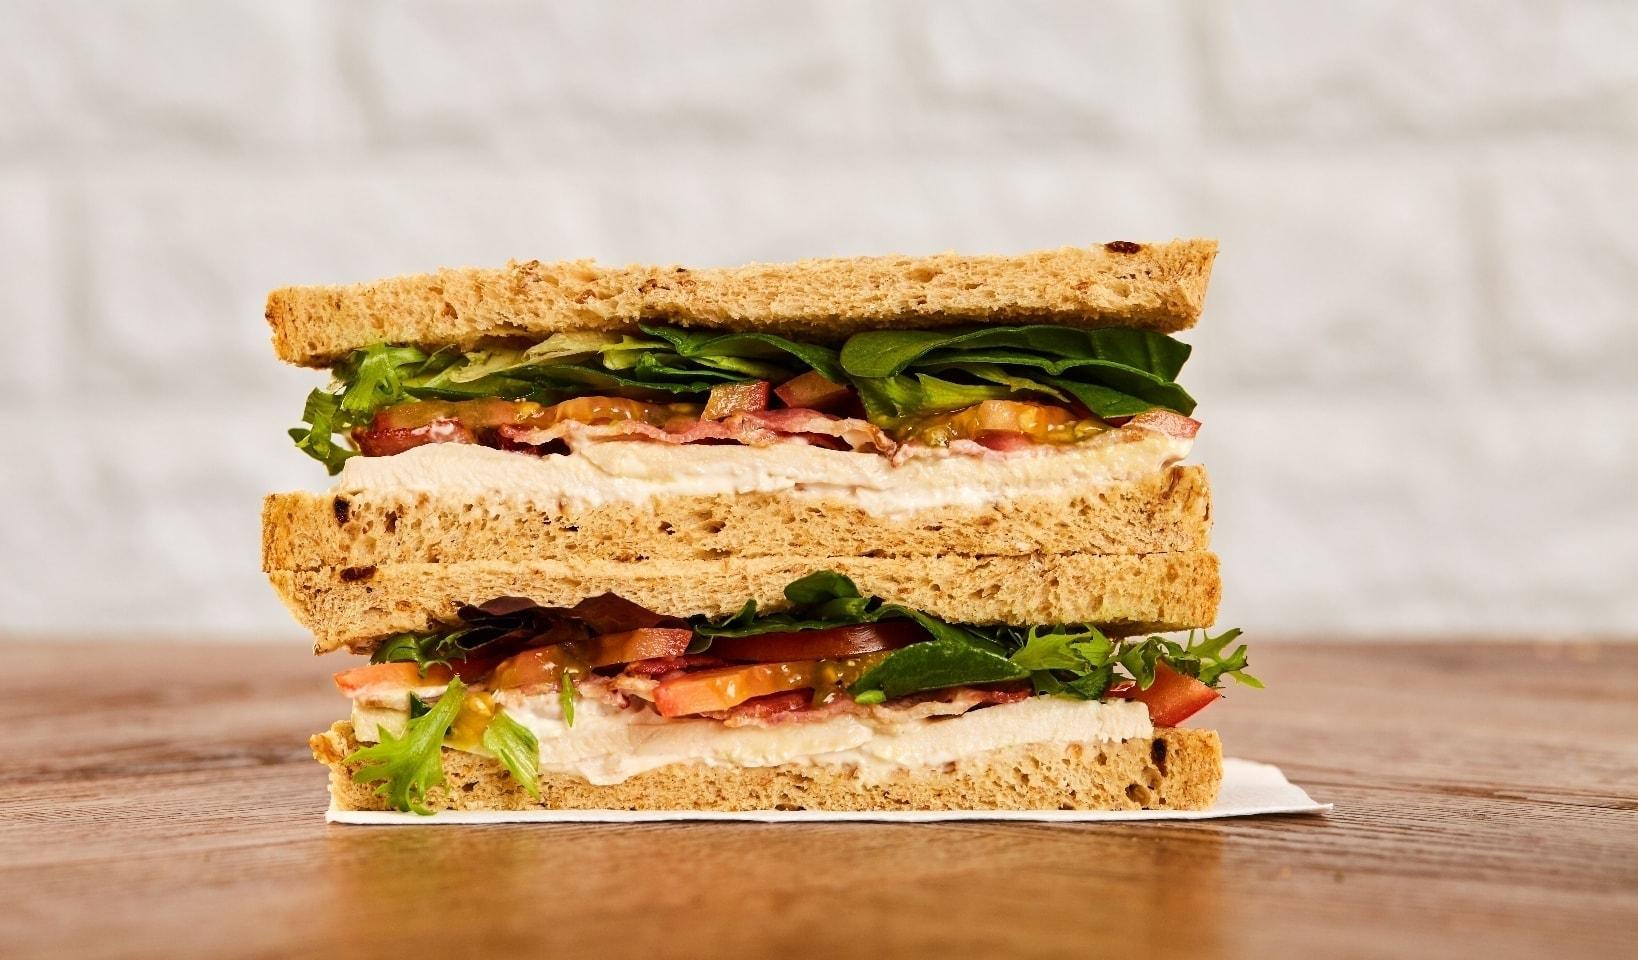 Pret ham and cheese sandwich